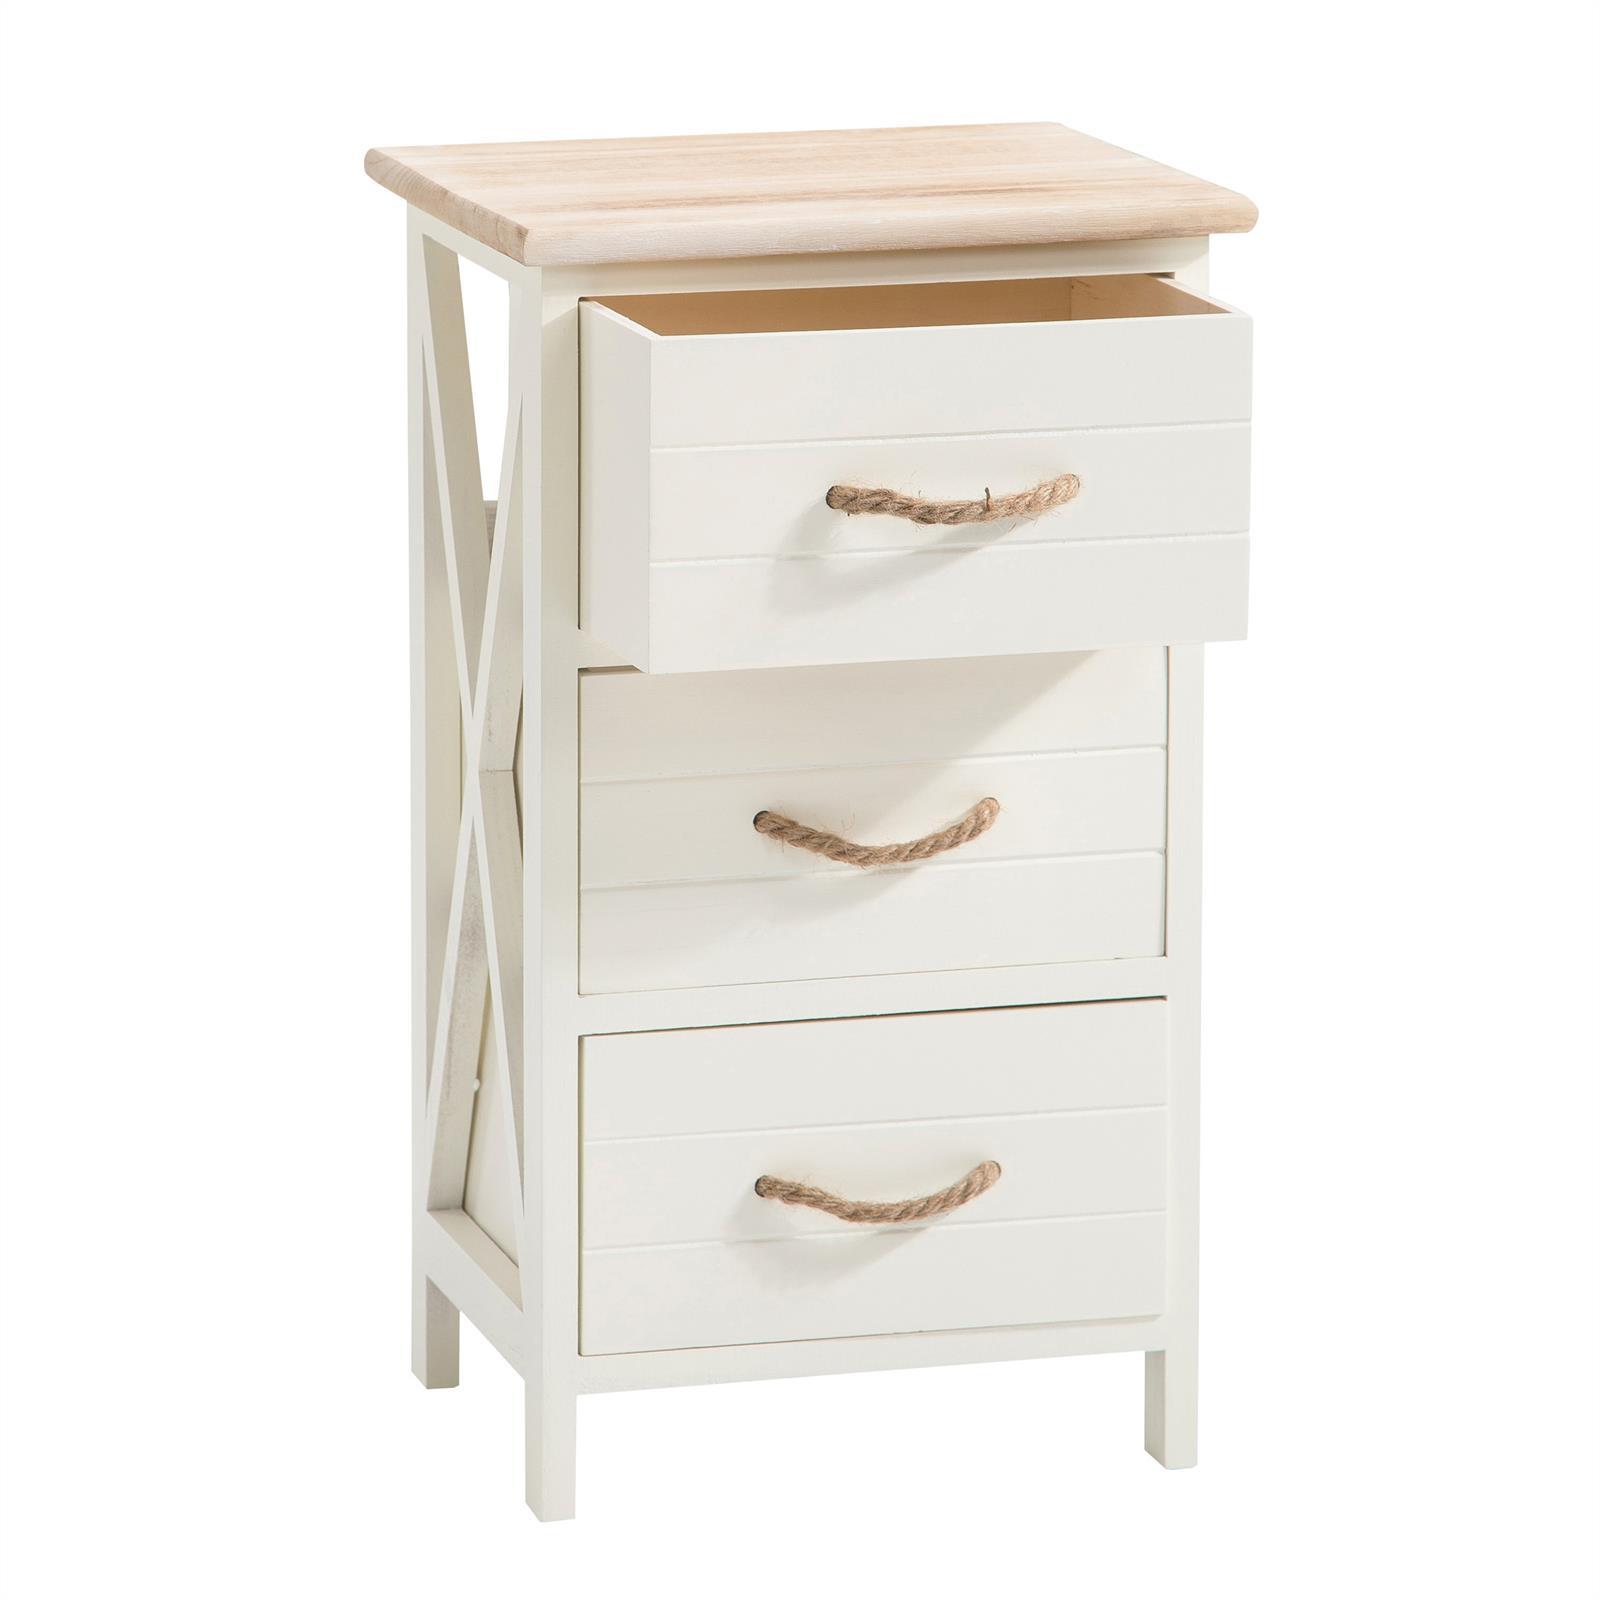 table de chevet perugia 3 tiroirs blanc mobil meubles. Black Bedroom Furniture Sets. Home Design Ideas